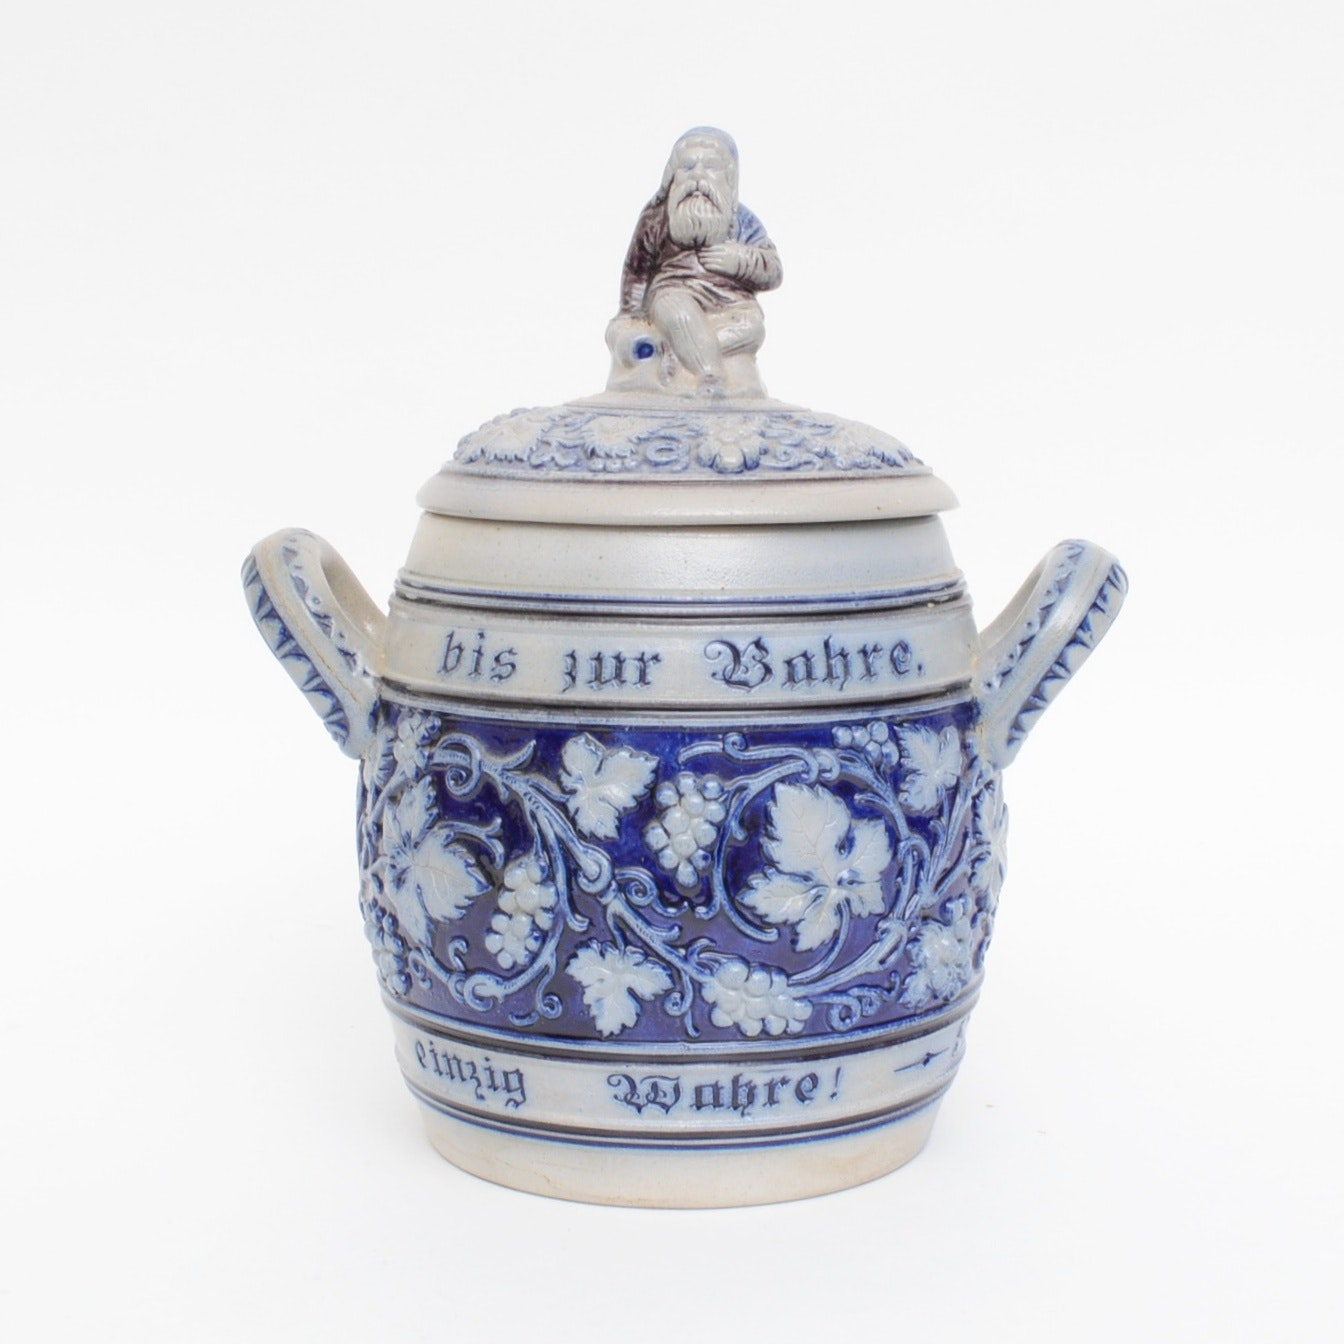 German Merkelbach & Wick Stoneware Soup Tureen, 1879-1921